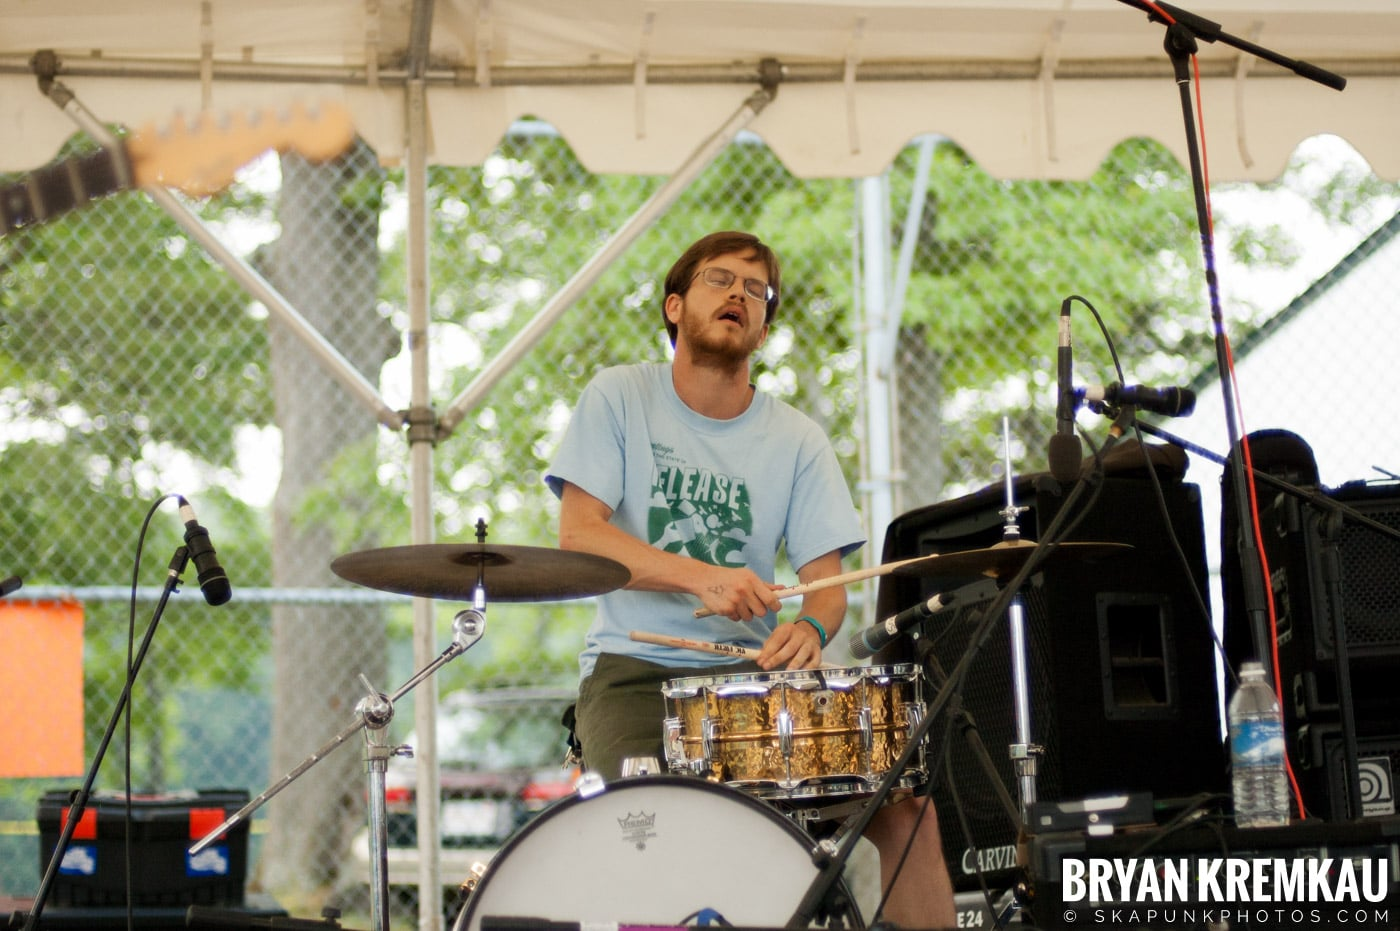 King Django @ The Big Orange Bonanza, Circleville, NY - 6.2.07 (4)